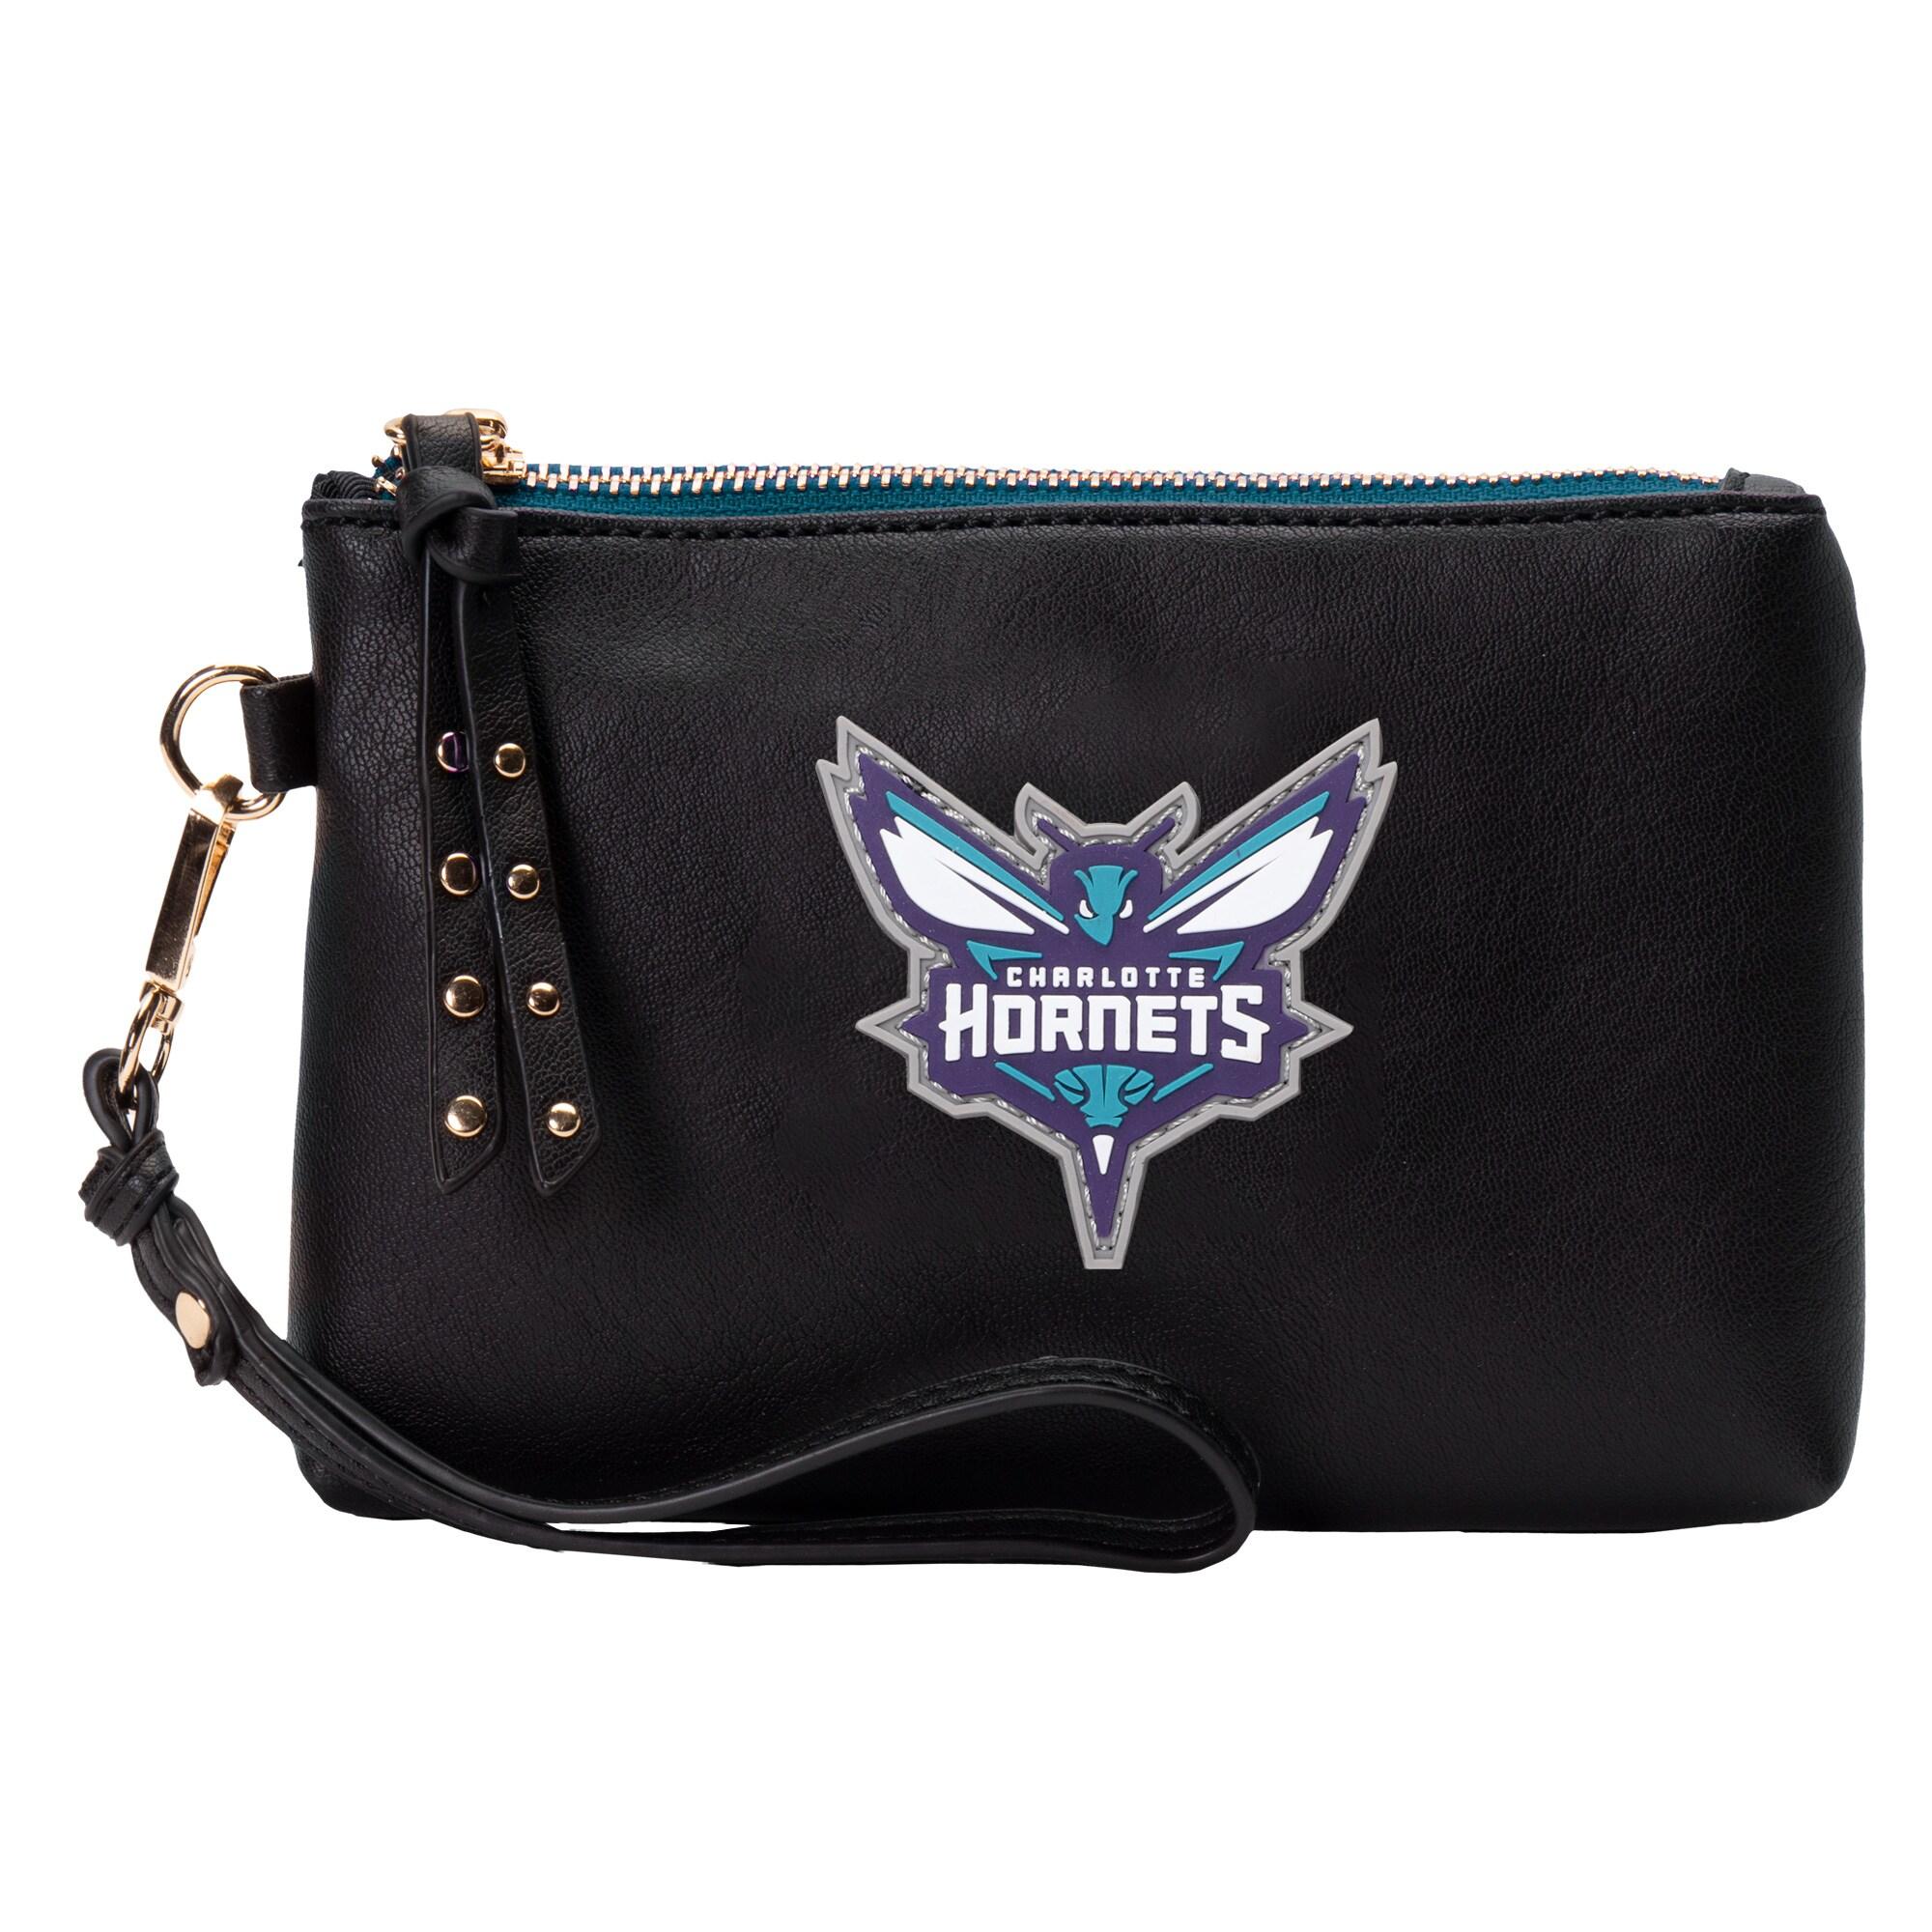 Charlotte Hornets Wristlet Pouch